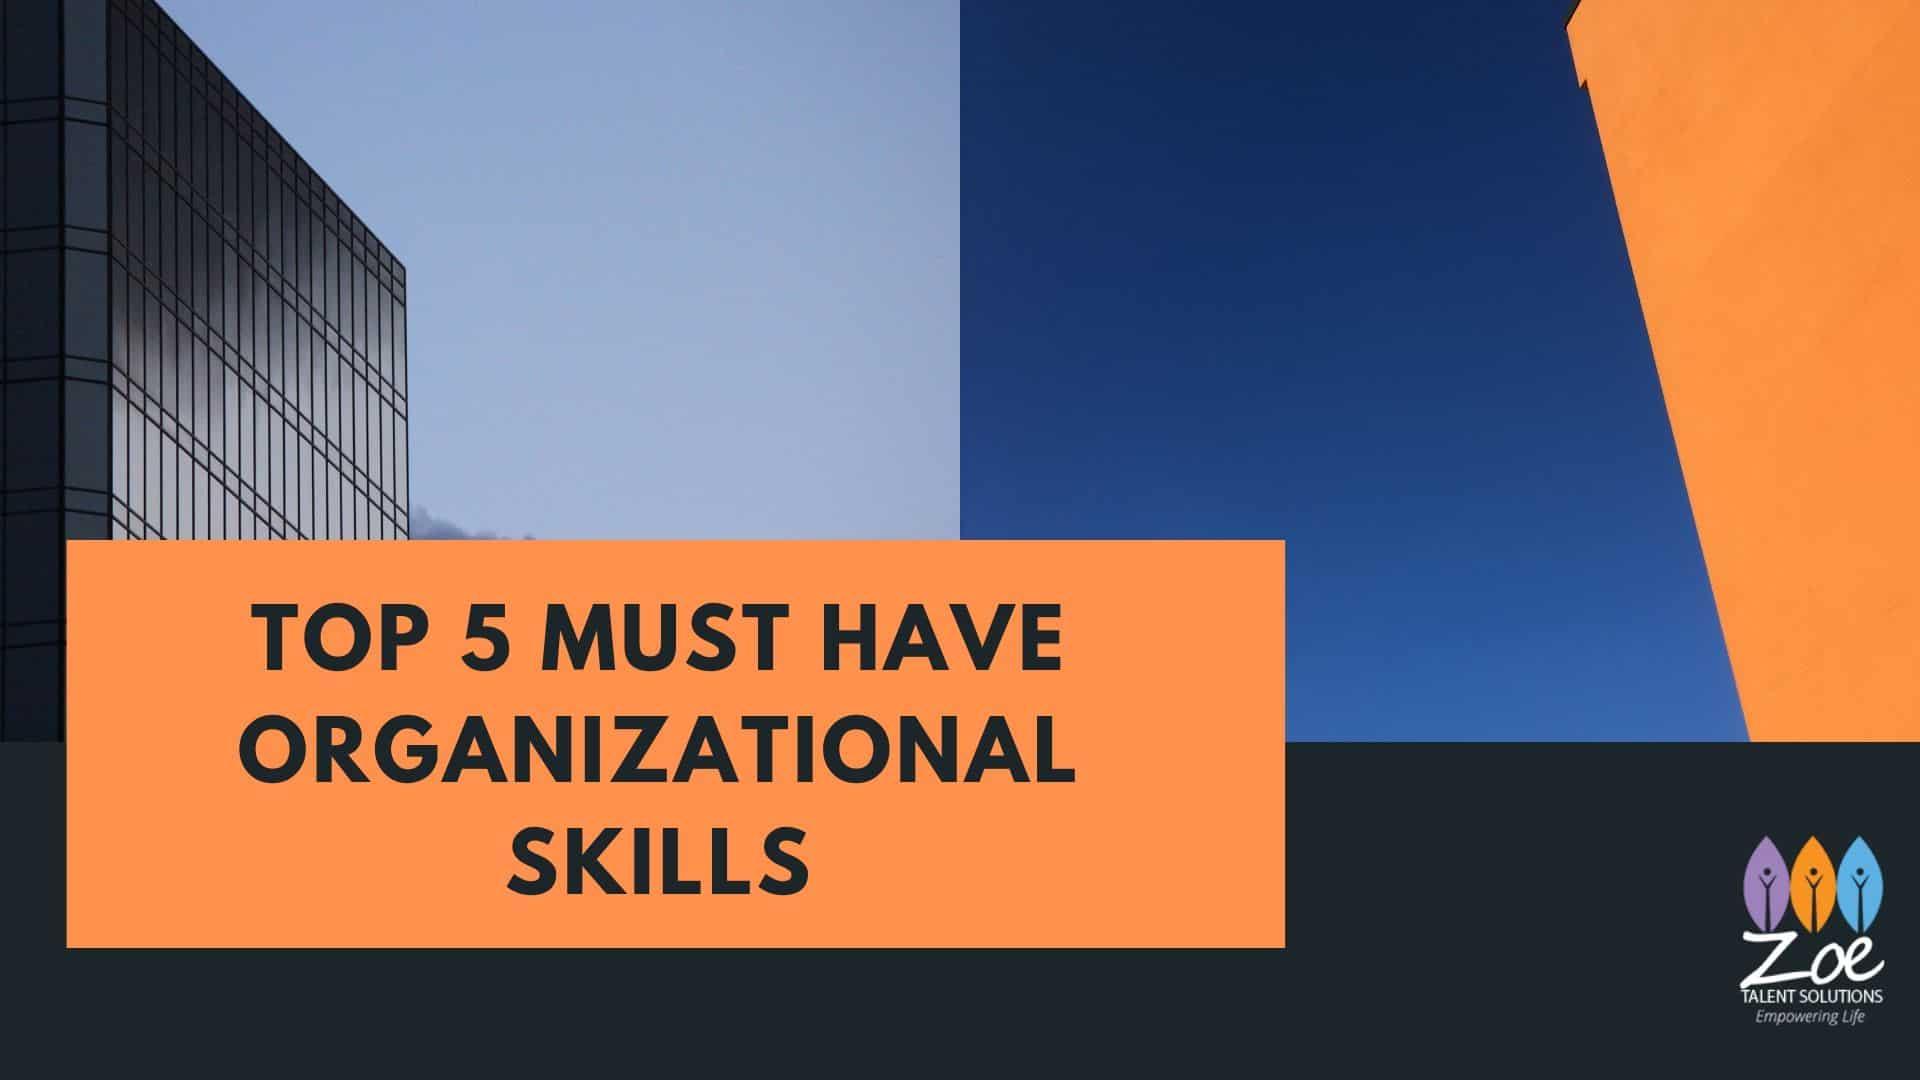 Top 5 Must Have Organizational Skills